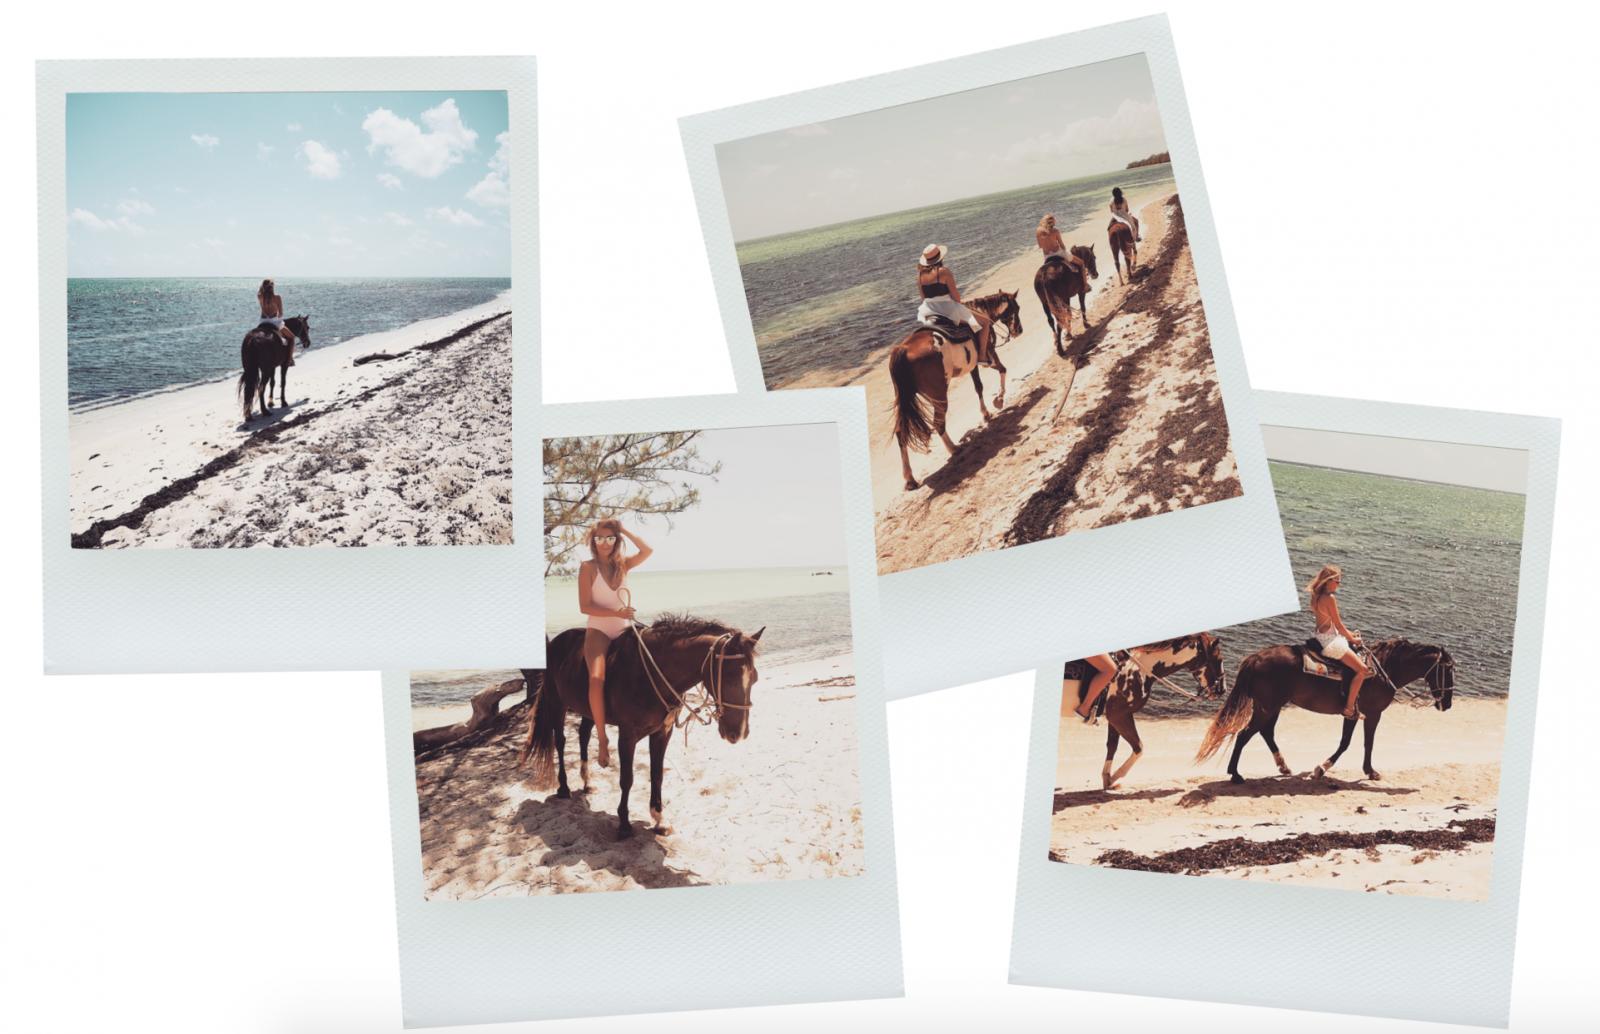 Cayman Islands Horse Riding on the Beach